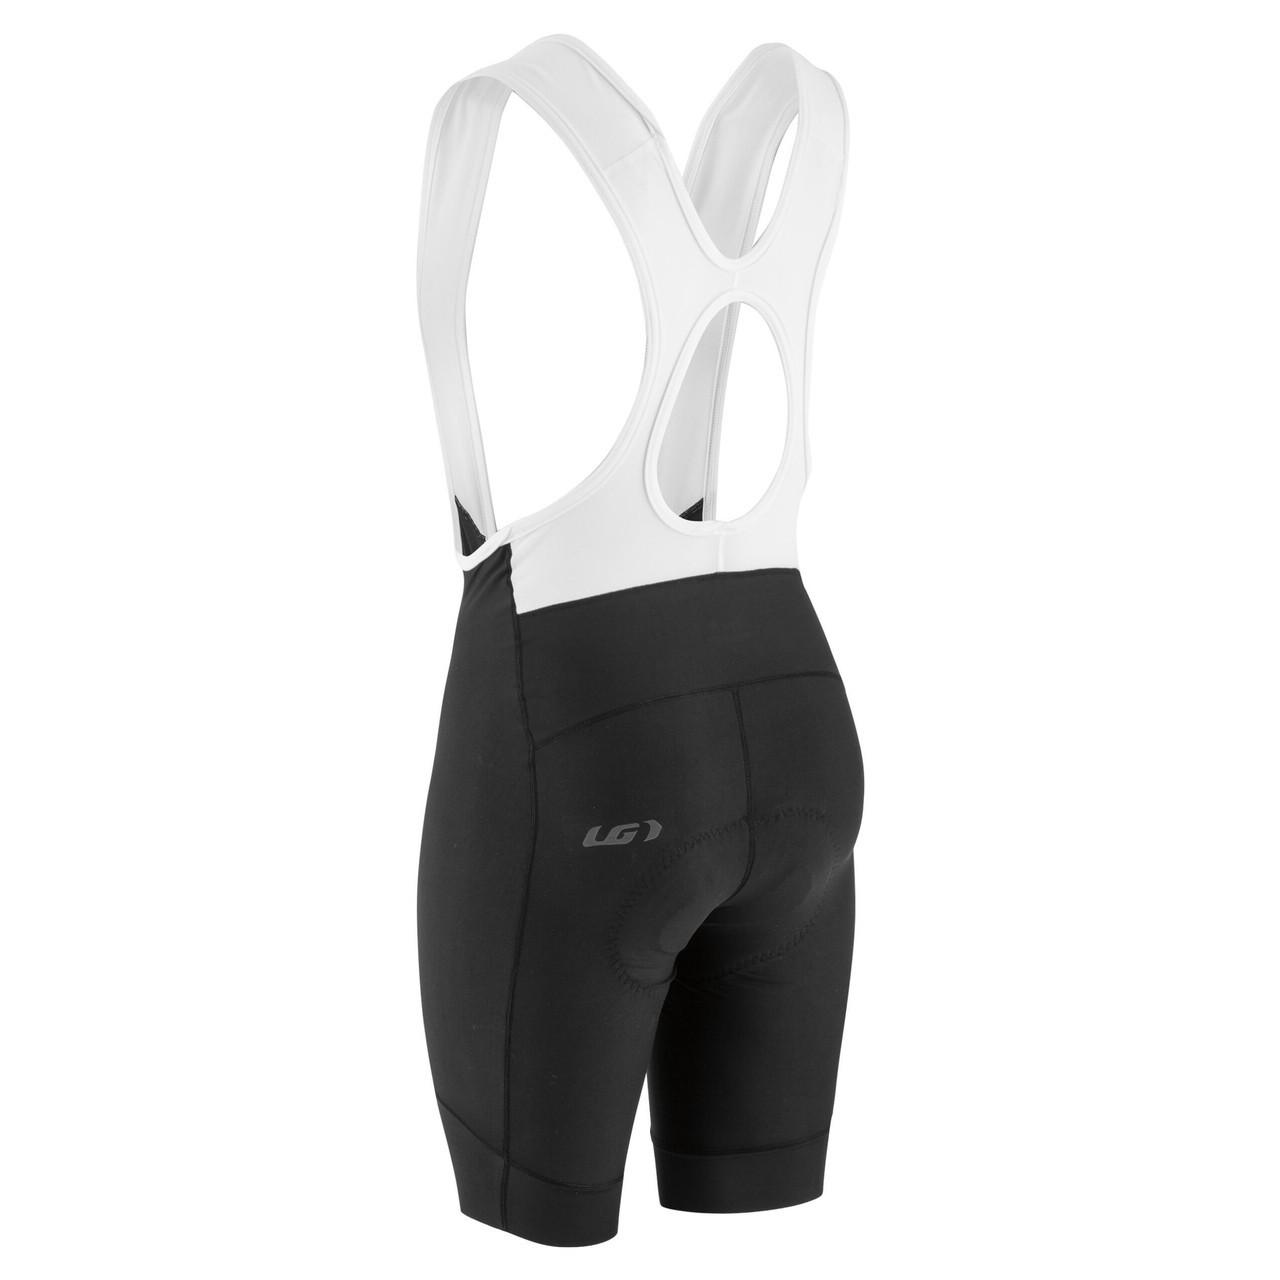 Louis Garneau Neo Power Motion Cyling Bib Shorts Men/'s XXL Dark Night